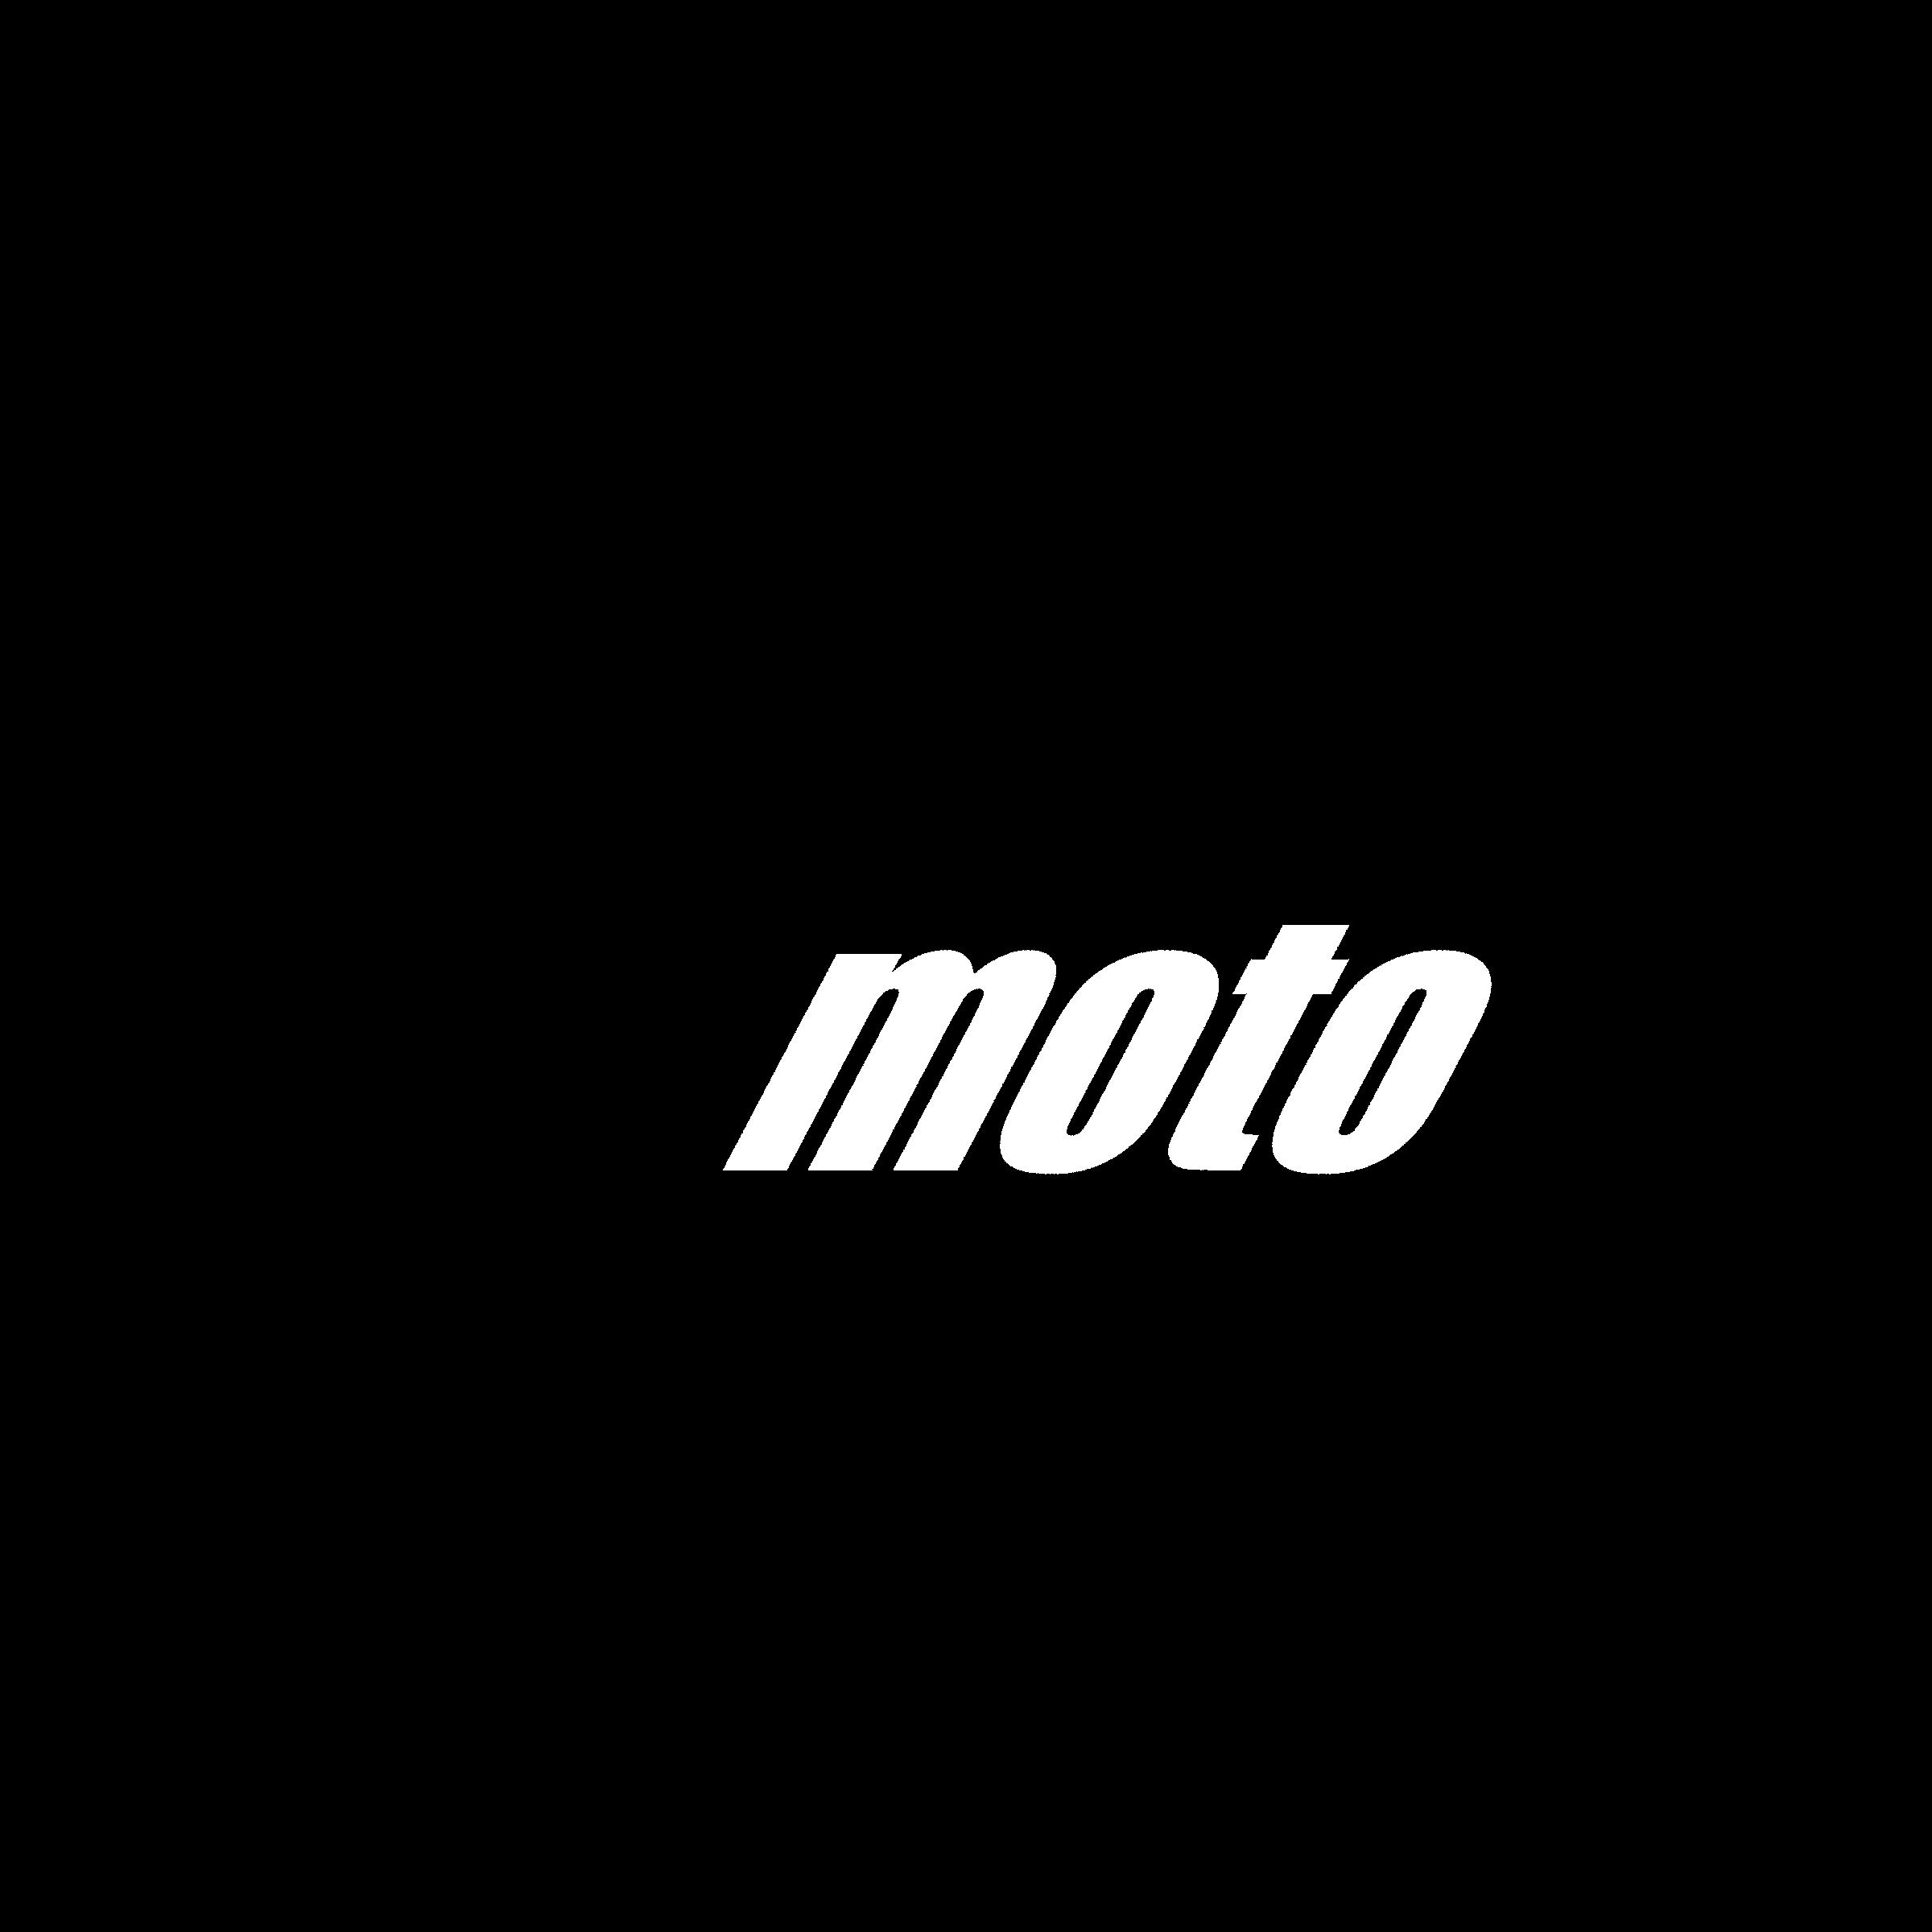 Moto Gp Logo Png Transparent Svg Vector Freebie Supply